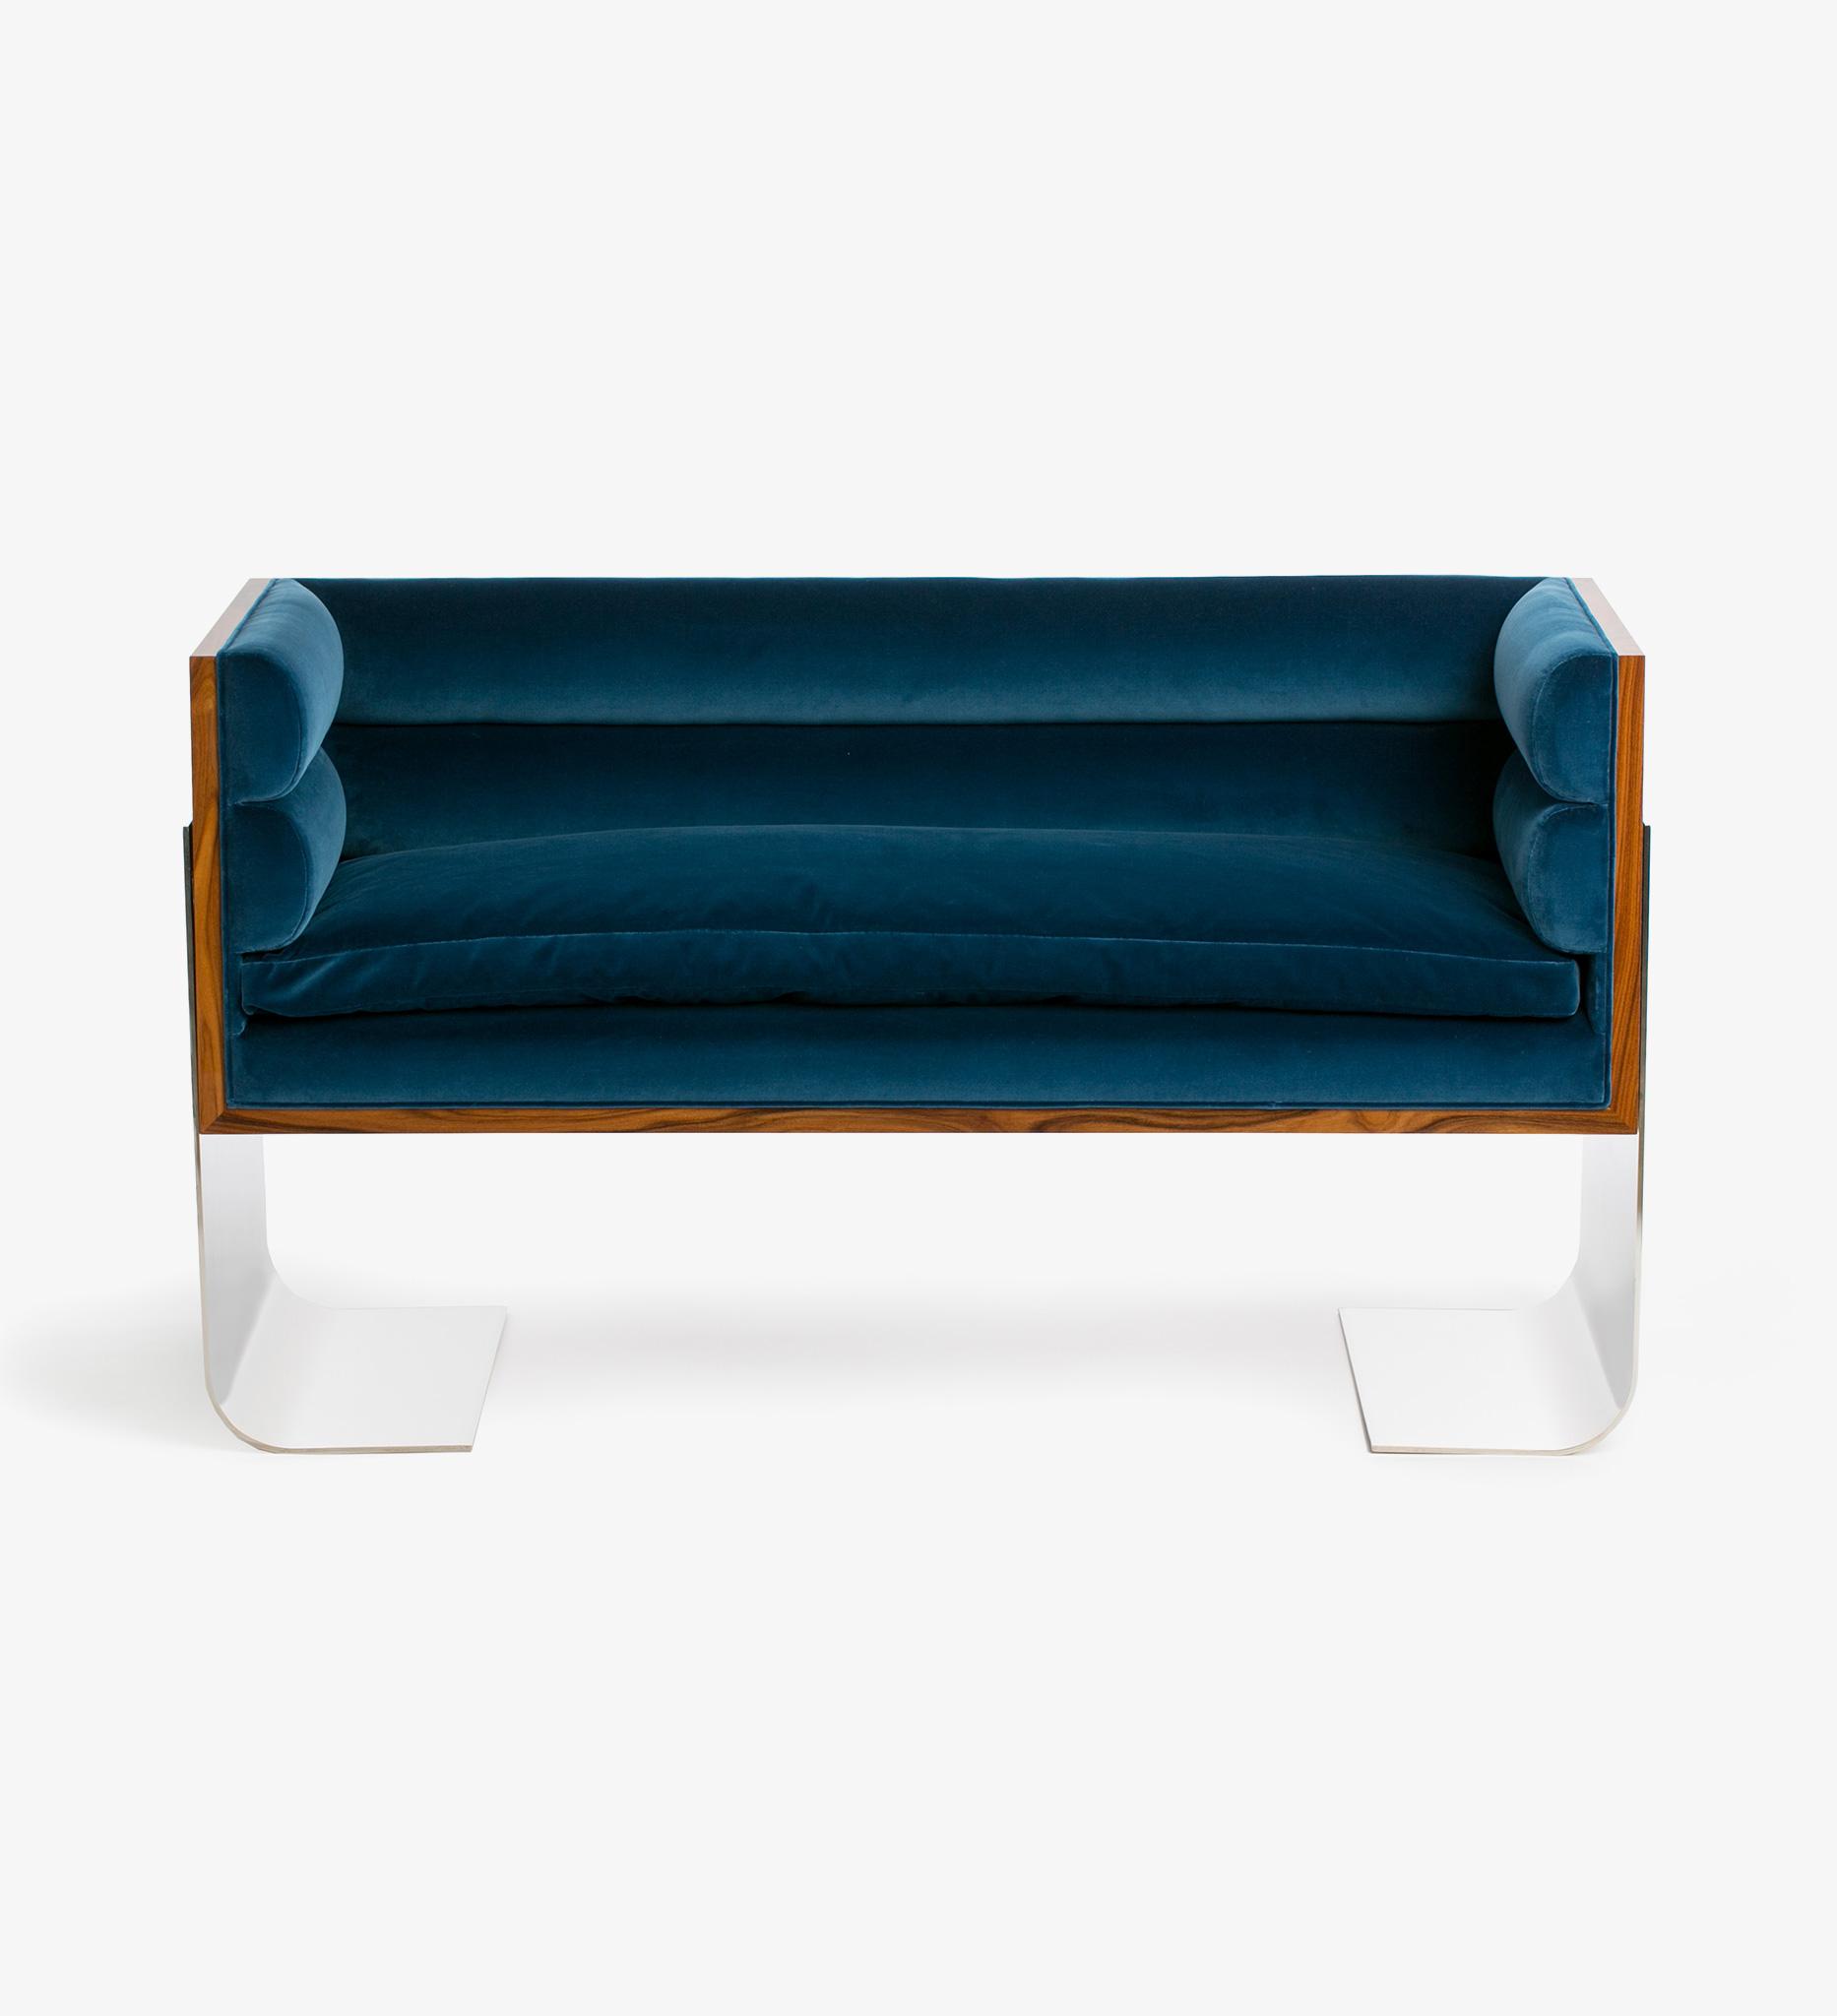 Sofa, Settee, Seating